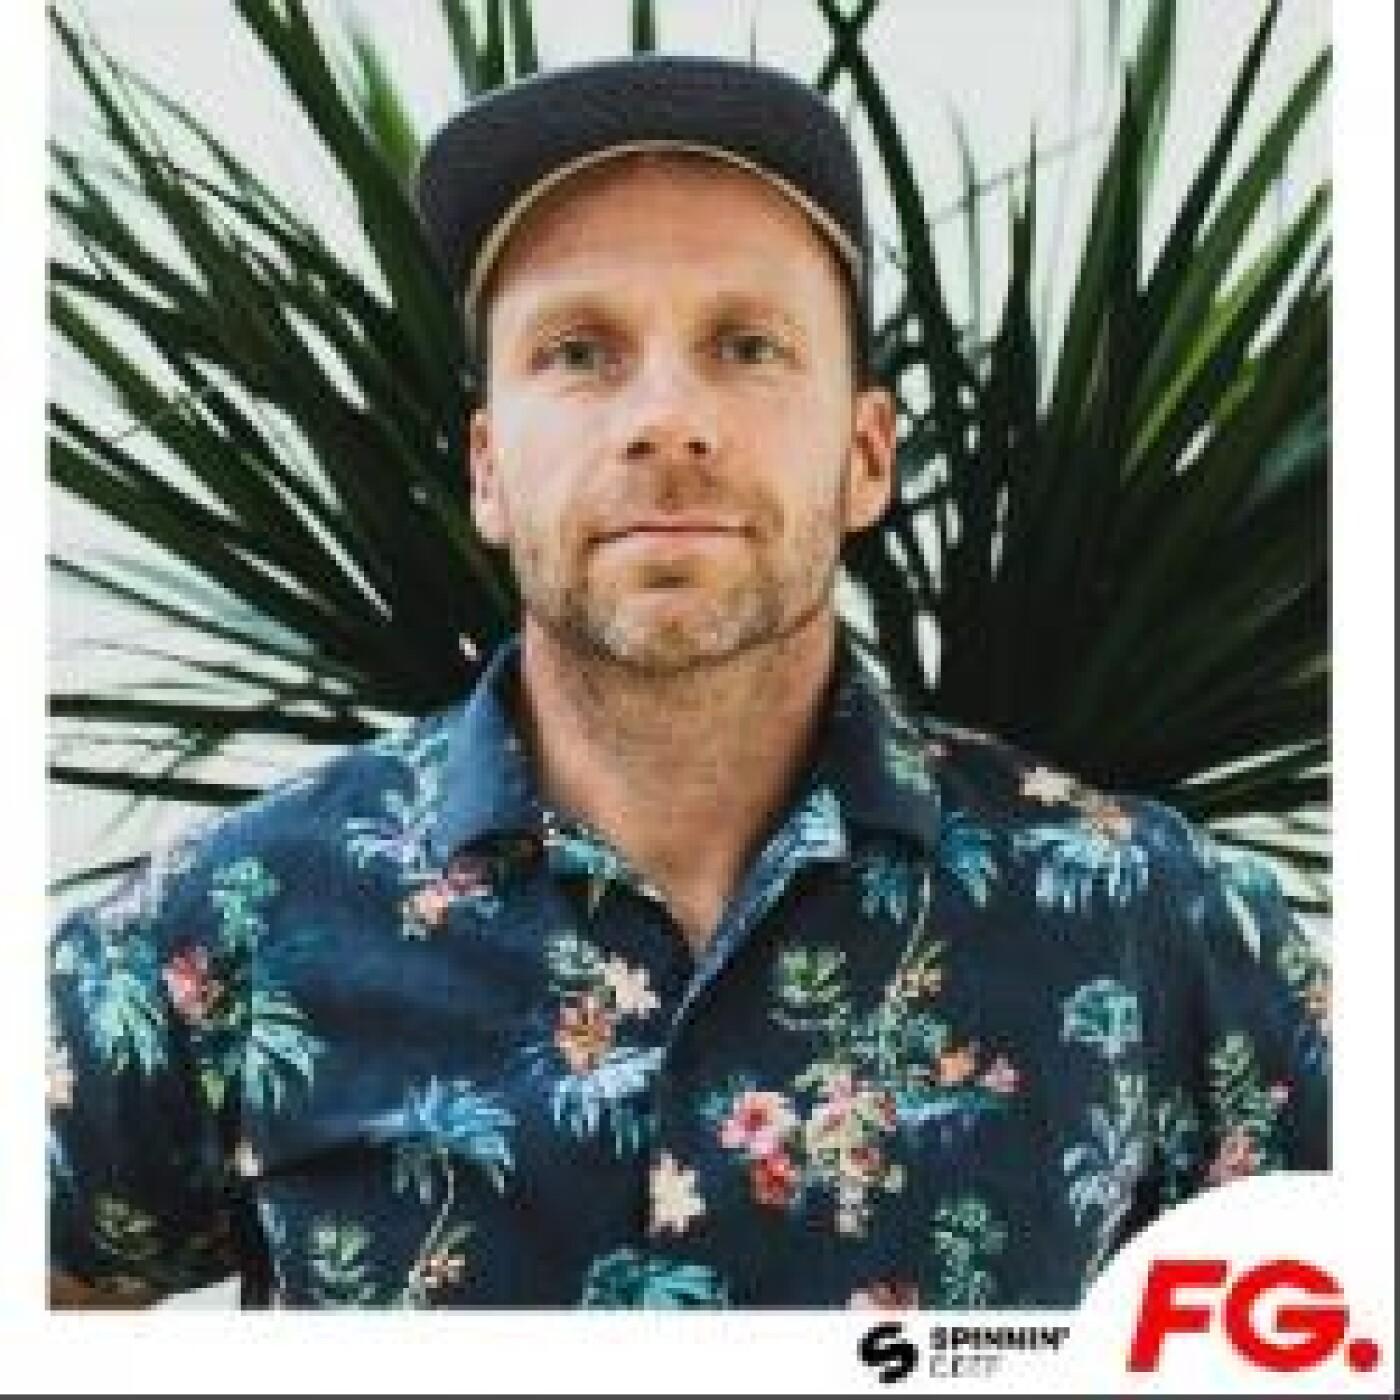 CLUB FG : MIKE MAGO